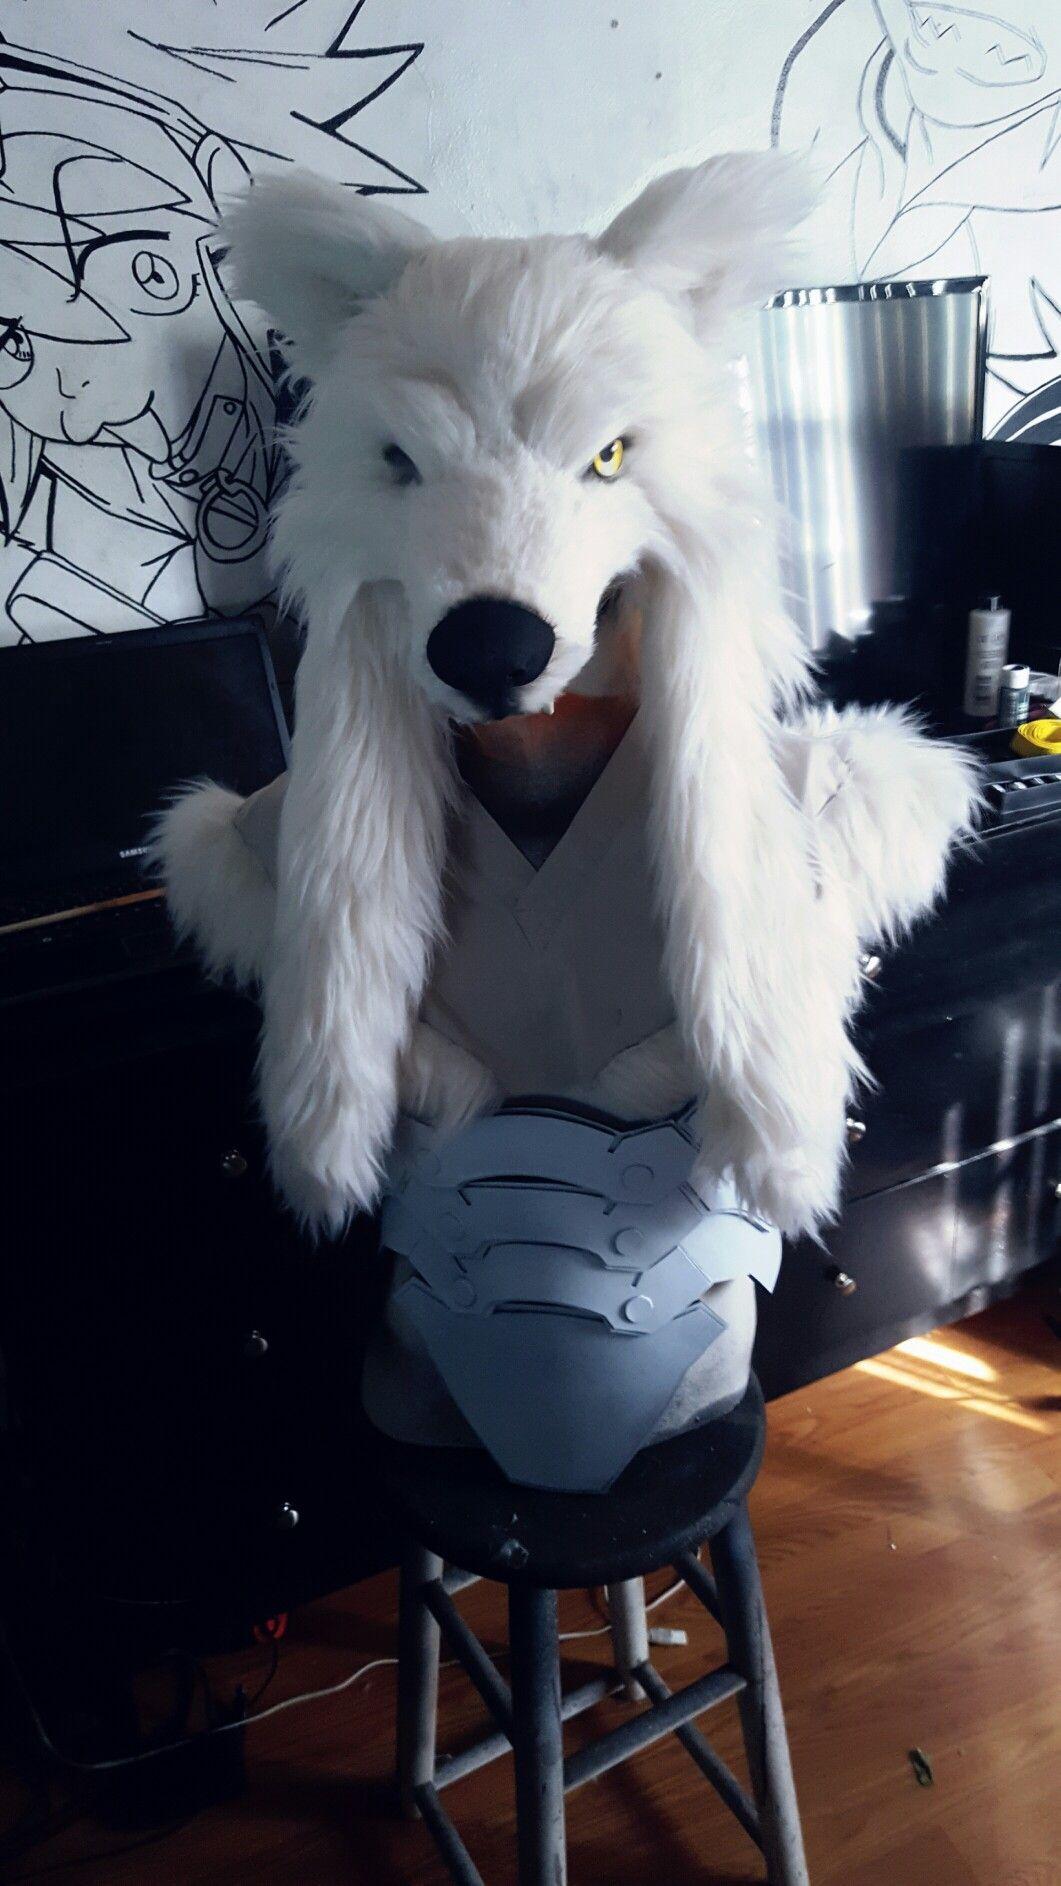 e71d1f2e Okami hanzo cosplay (WIP)   my cosplays/props/DIY   Cosplay, Wolf ...